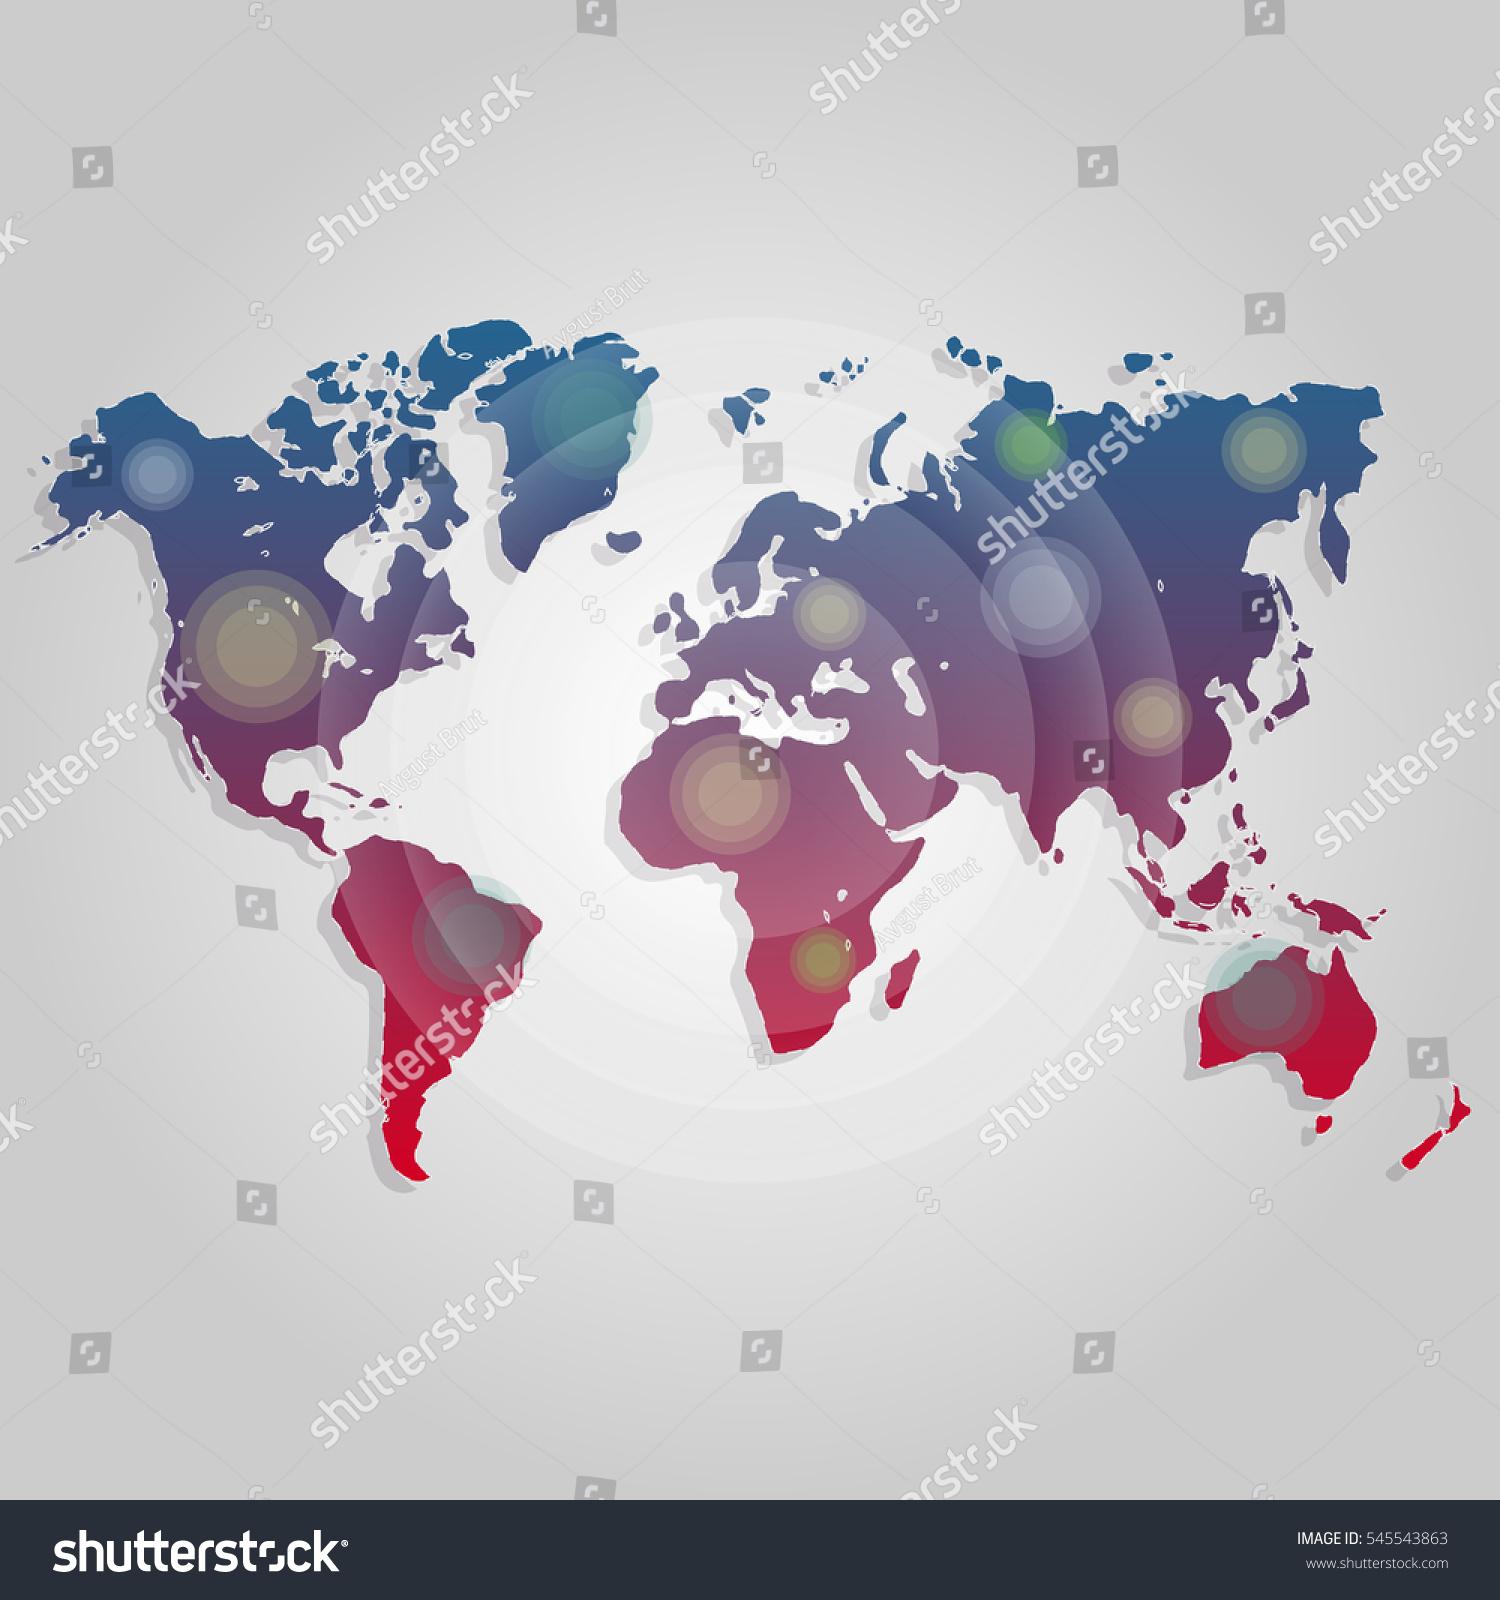 Map Design Website Template: Vector World Map Connection Worldmap Template Stock Vector